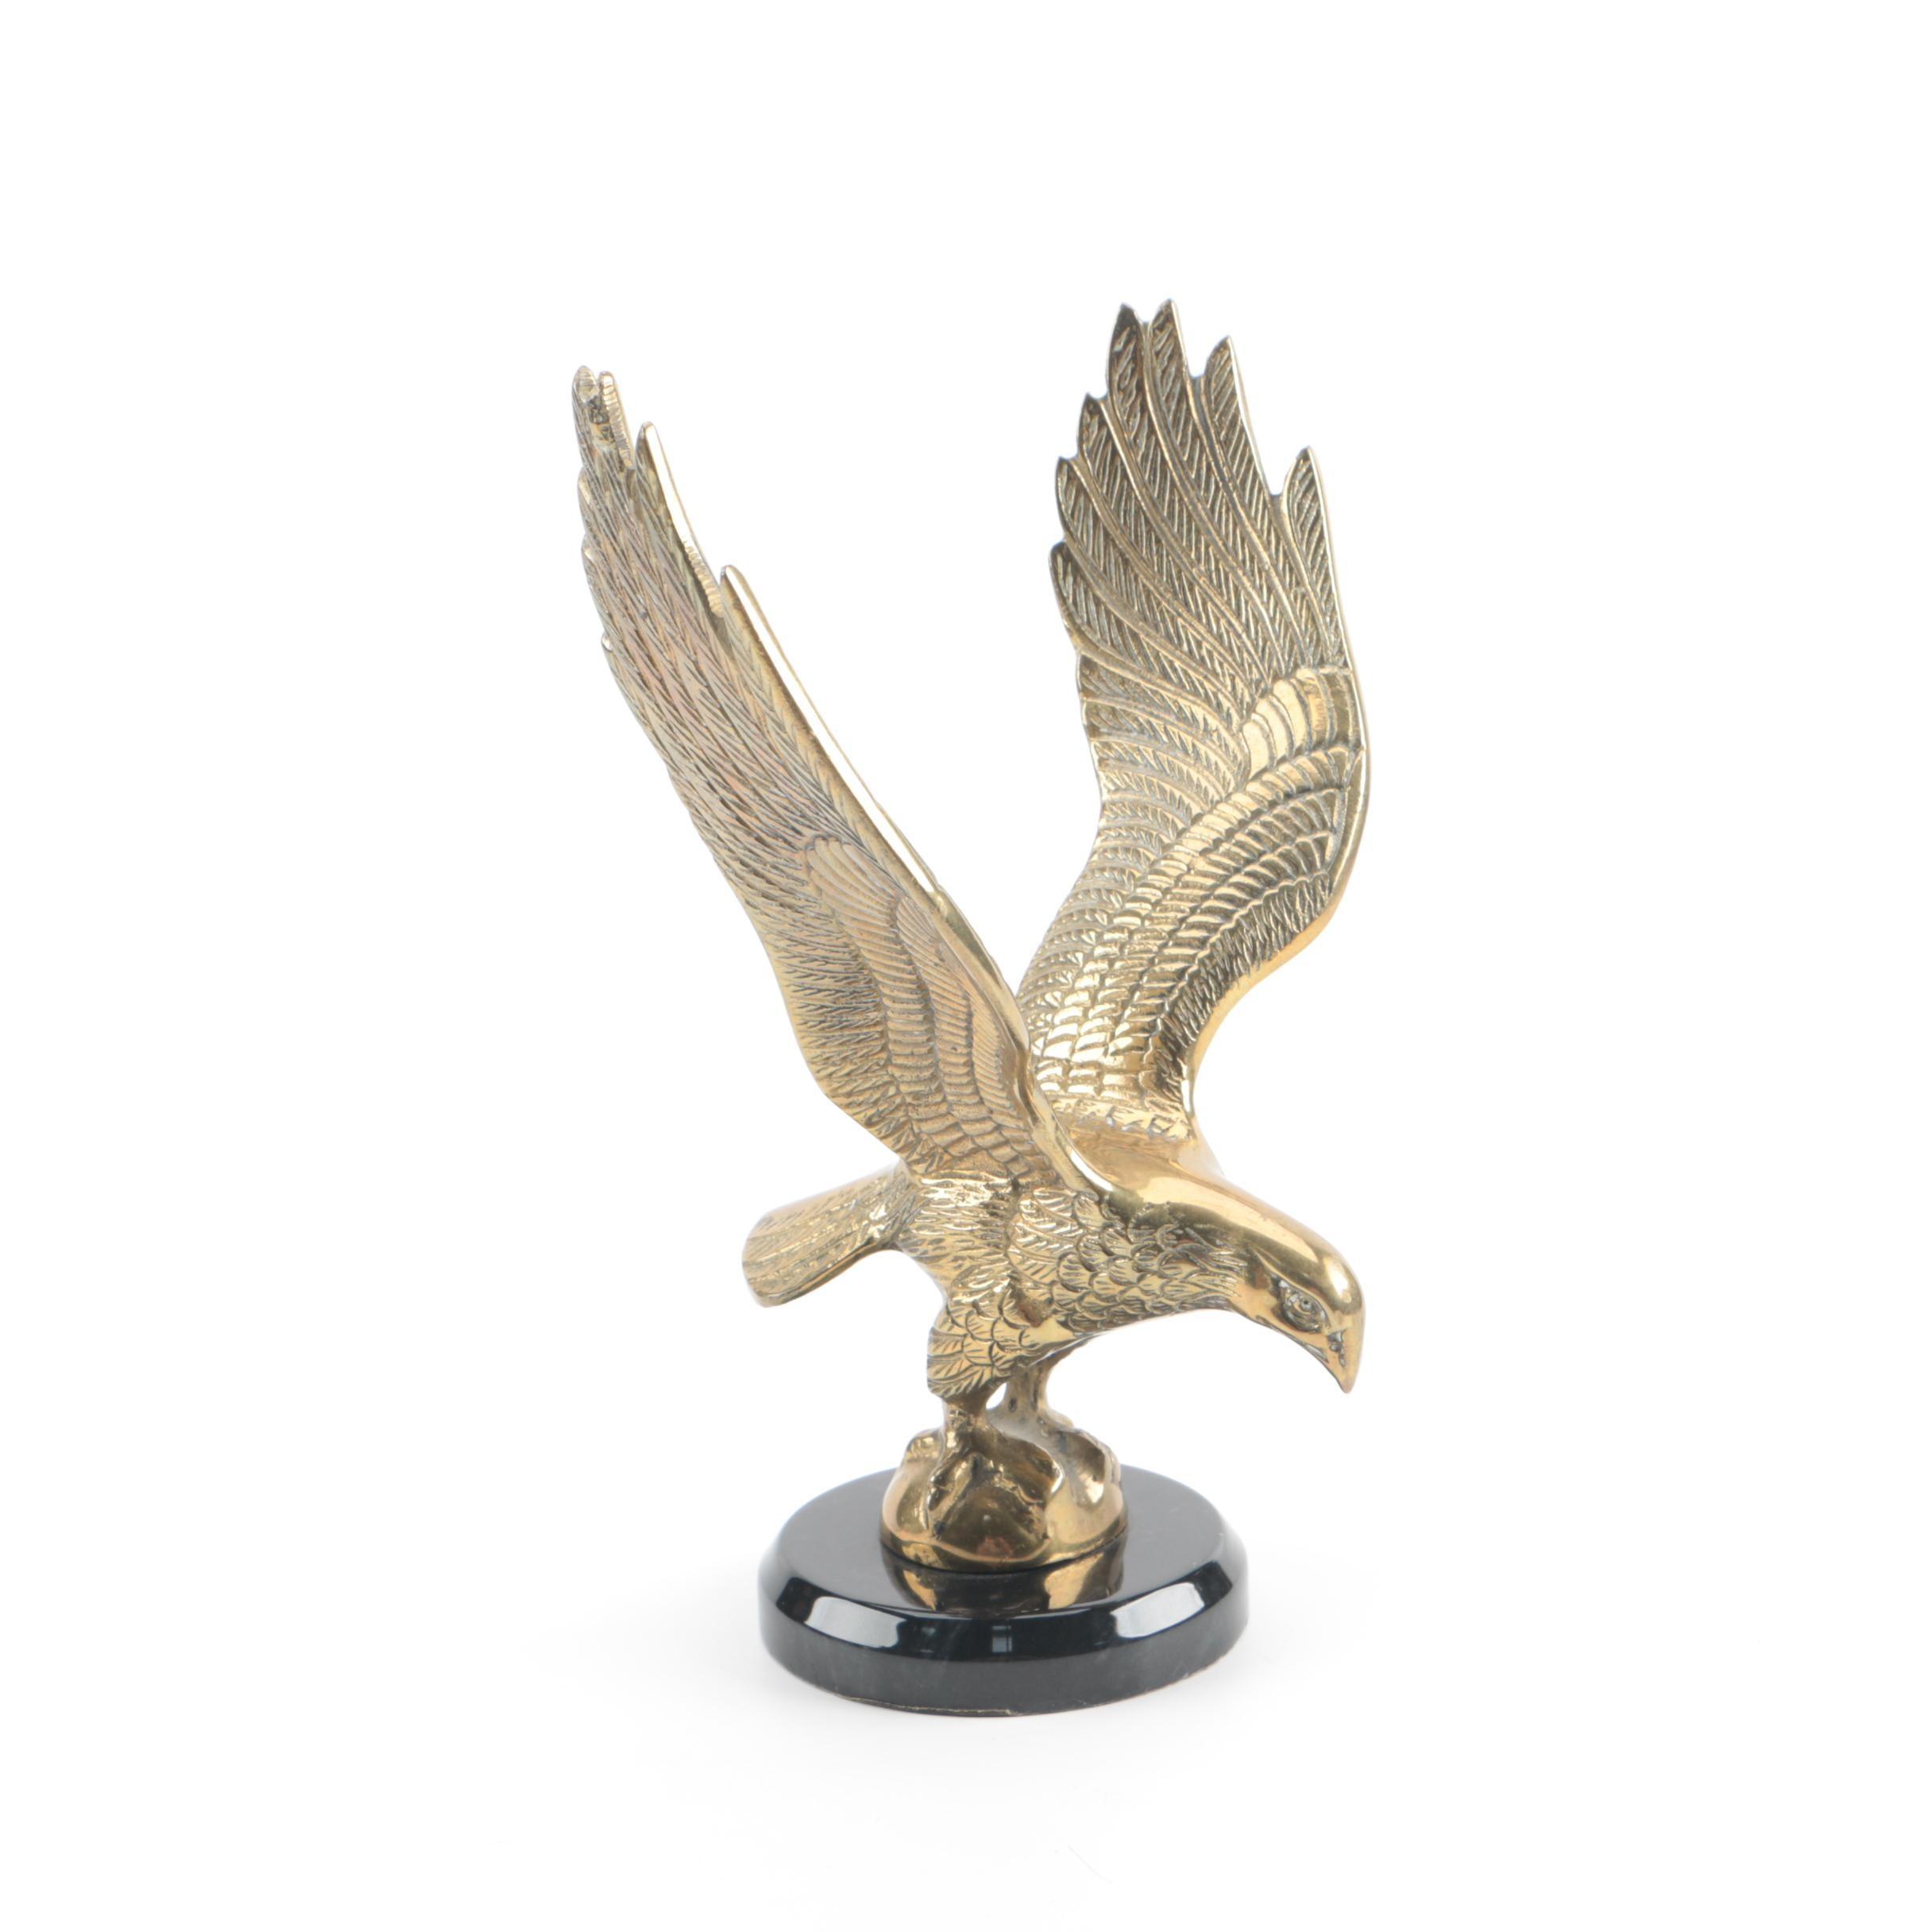 Brass Eagle Figurine on Enameled Stand